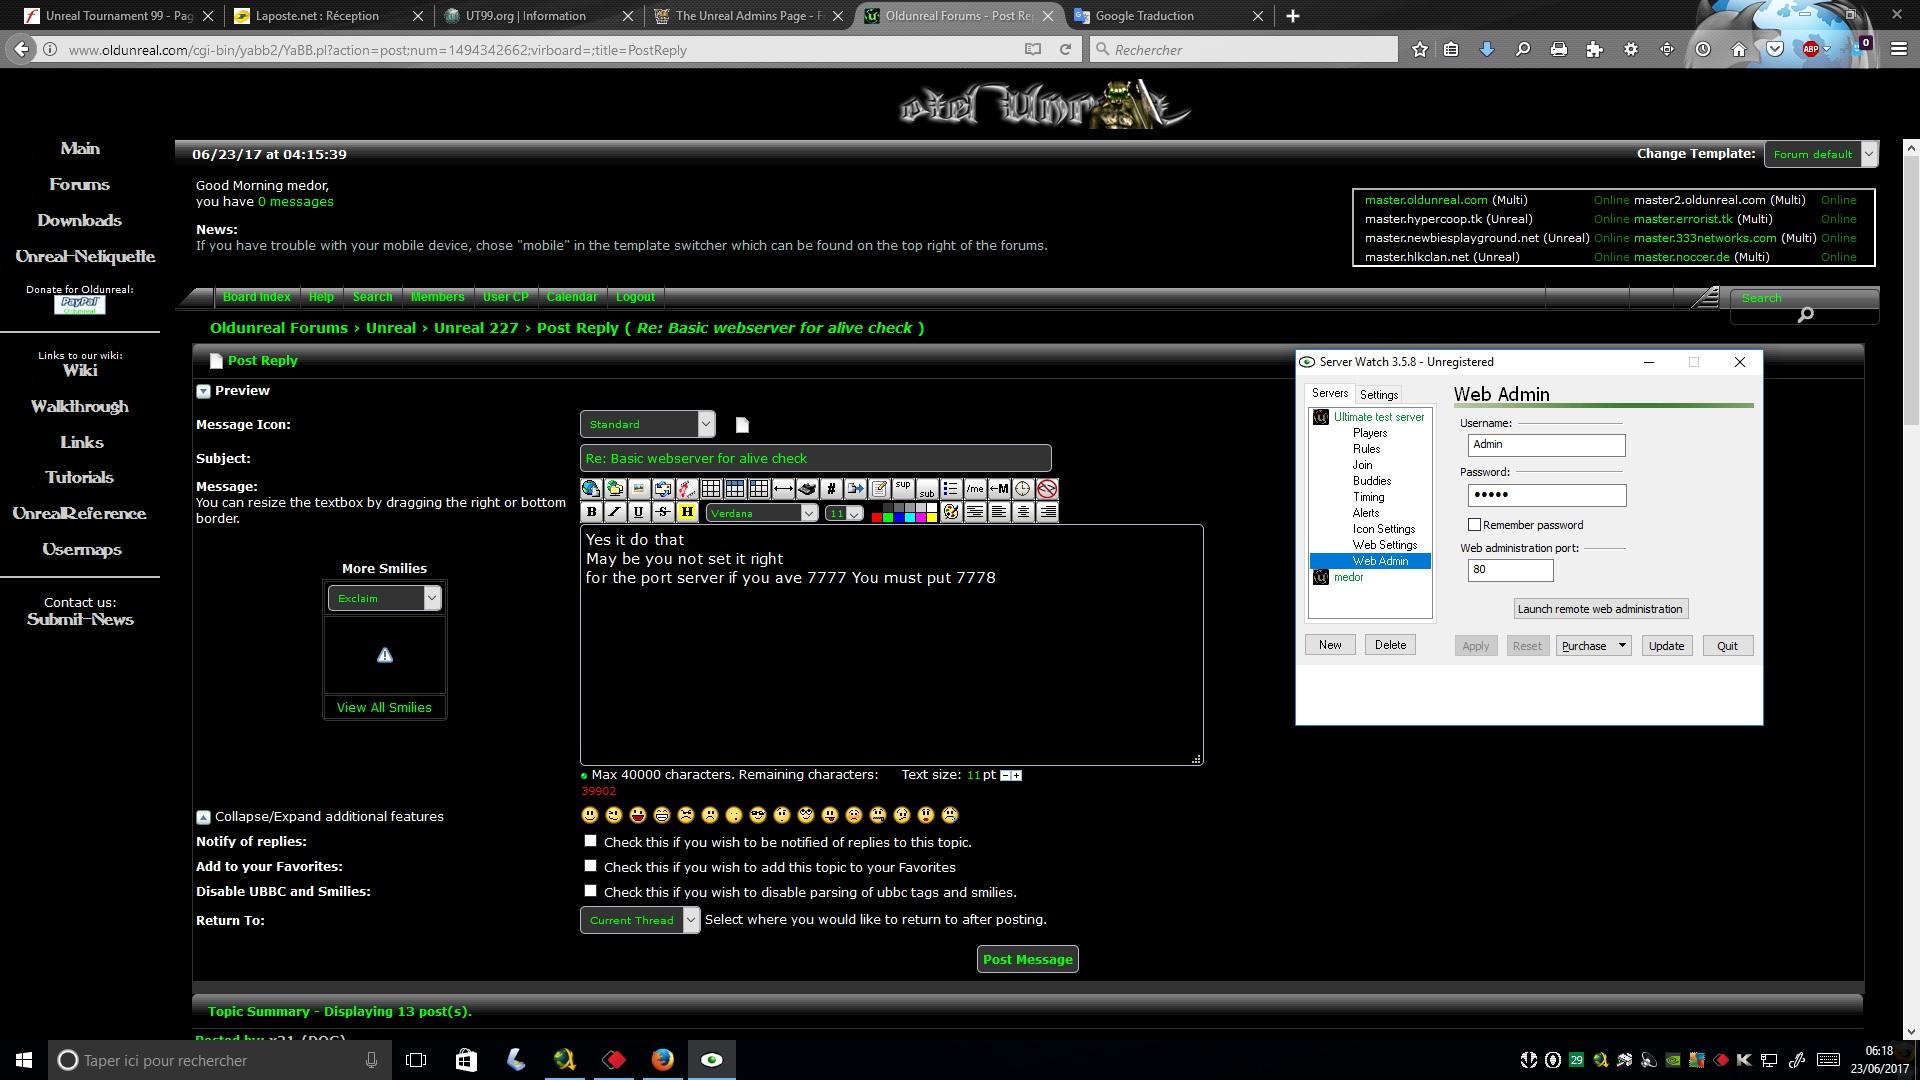 ServerWatch.jpg